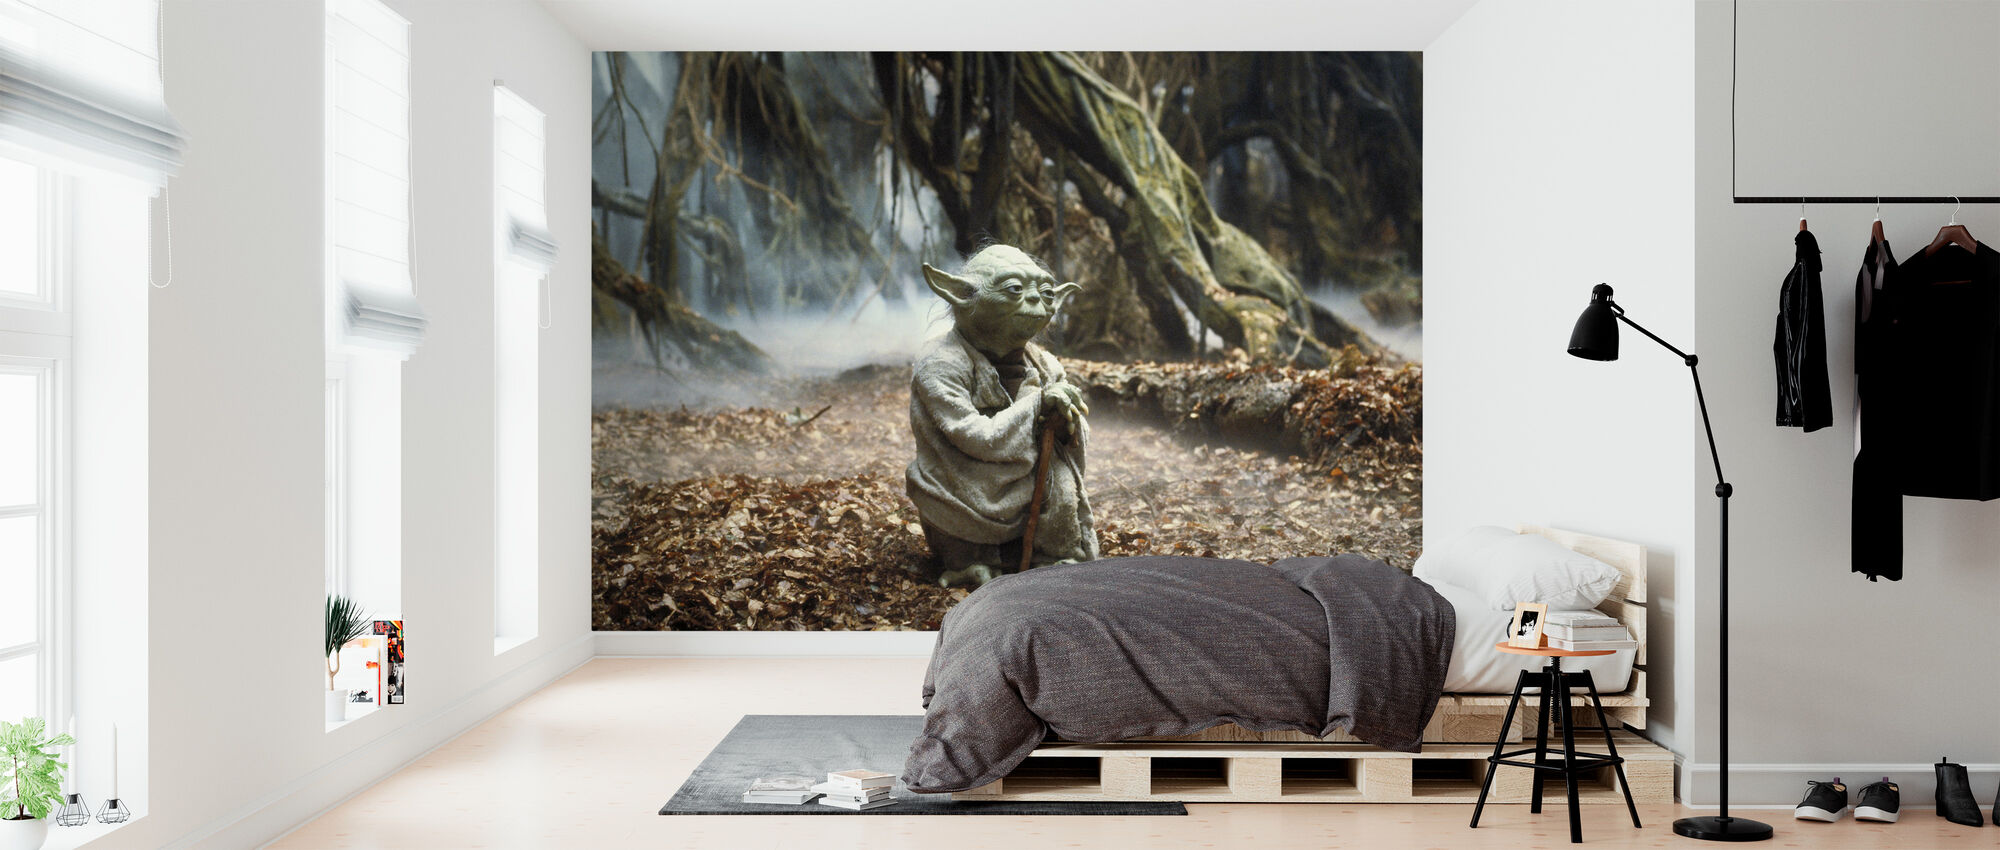 Stjärnornas krig - Yoda Dagobah 2 - Tapet - Sovrum